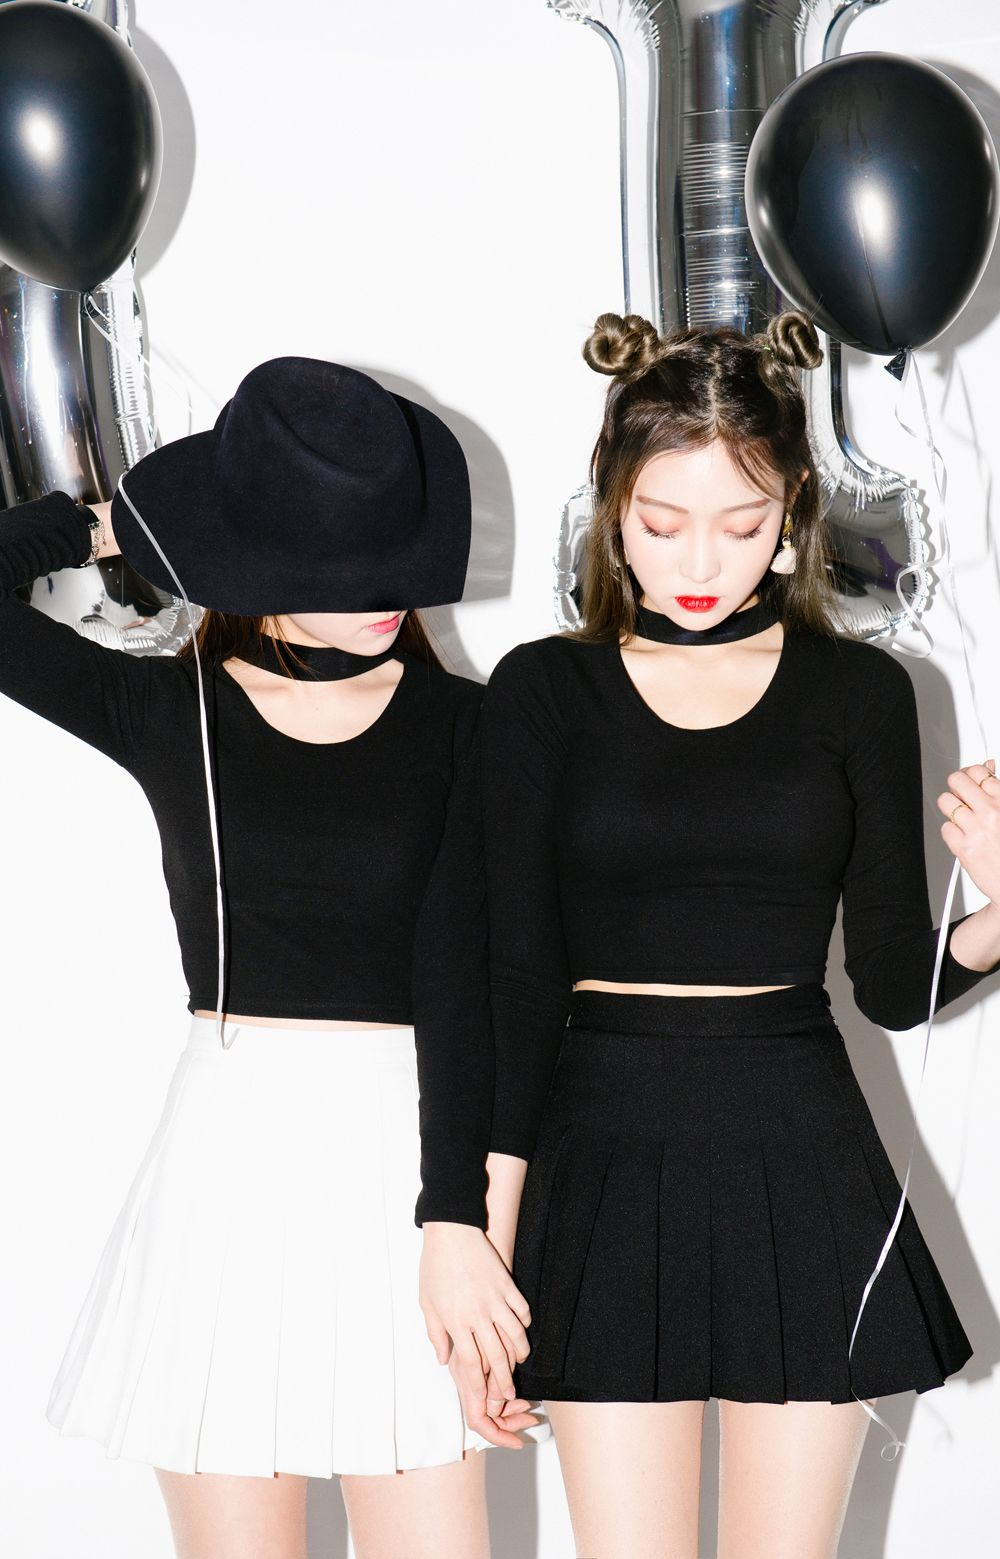 Black dress korean -  Mixxmix Choker Crop Top Bwju Aspire For A Retro Cool Look With This